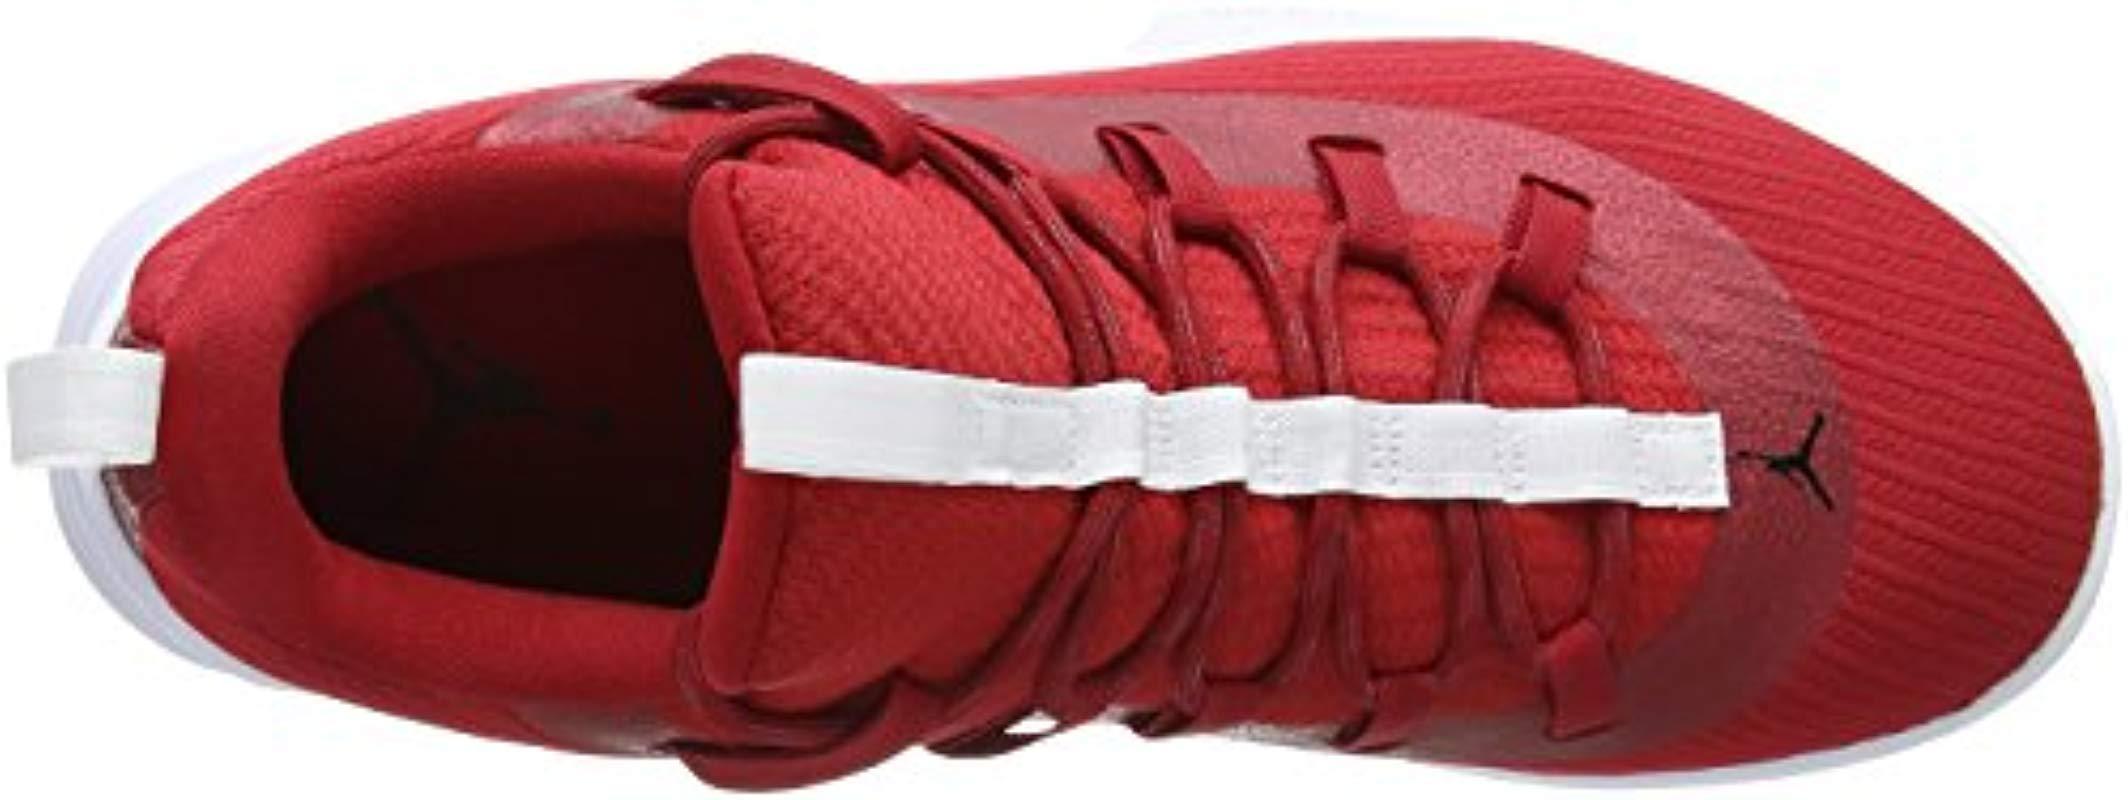 buy popular b8aee bfdf1 Nike Jordan Ultra Fly 2 Low Basketball Shoes in Red ...